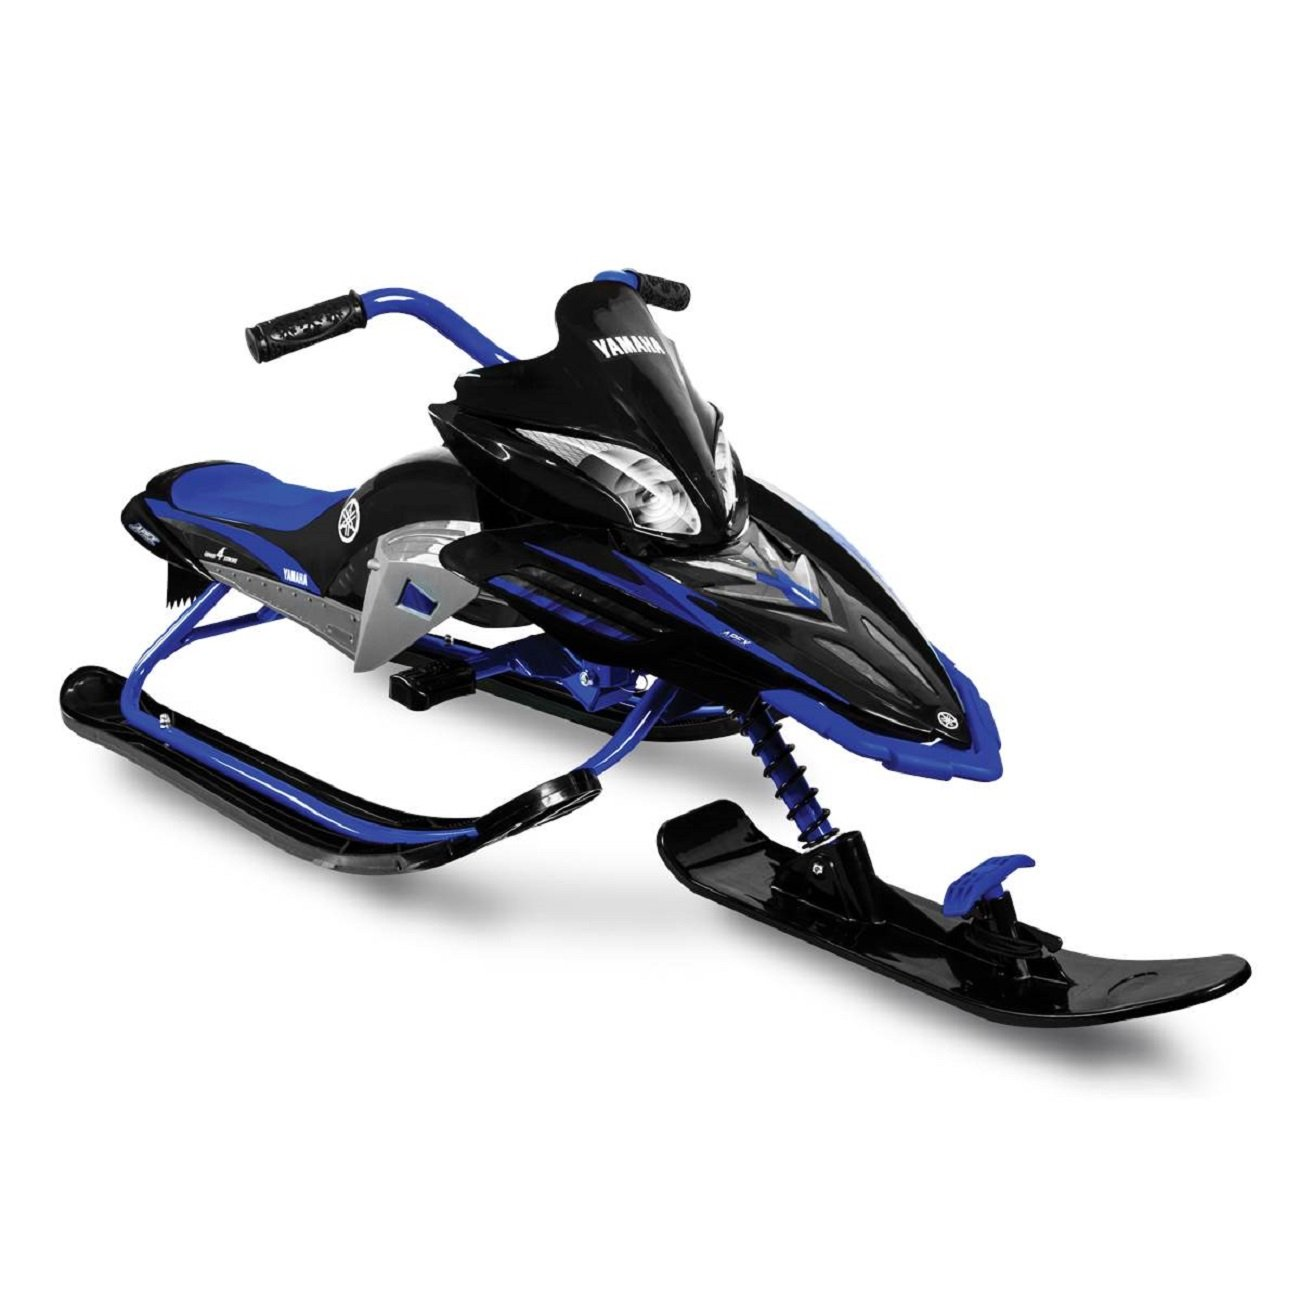 Yamaha Apex Snow Bike - Max weight capacity: 88 lbs. - Blue/Black by YAM-AHA